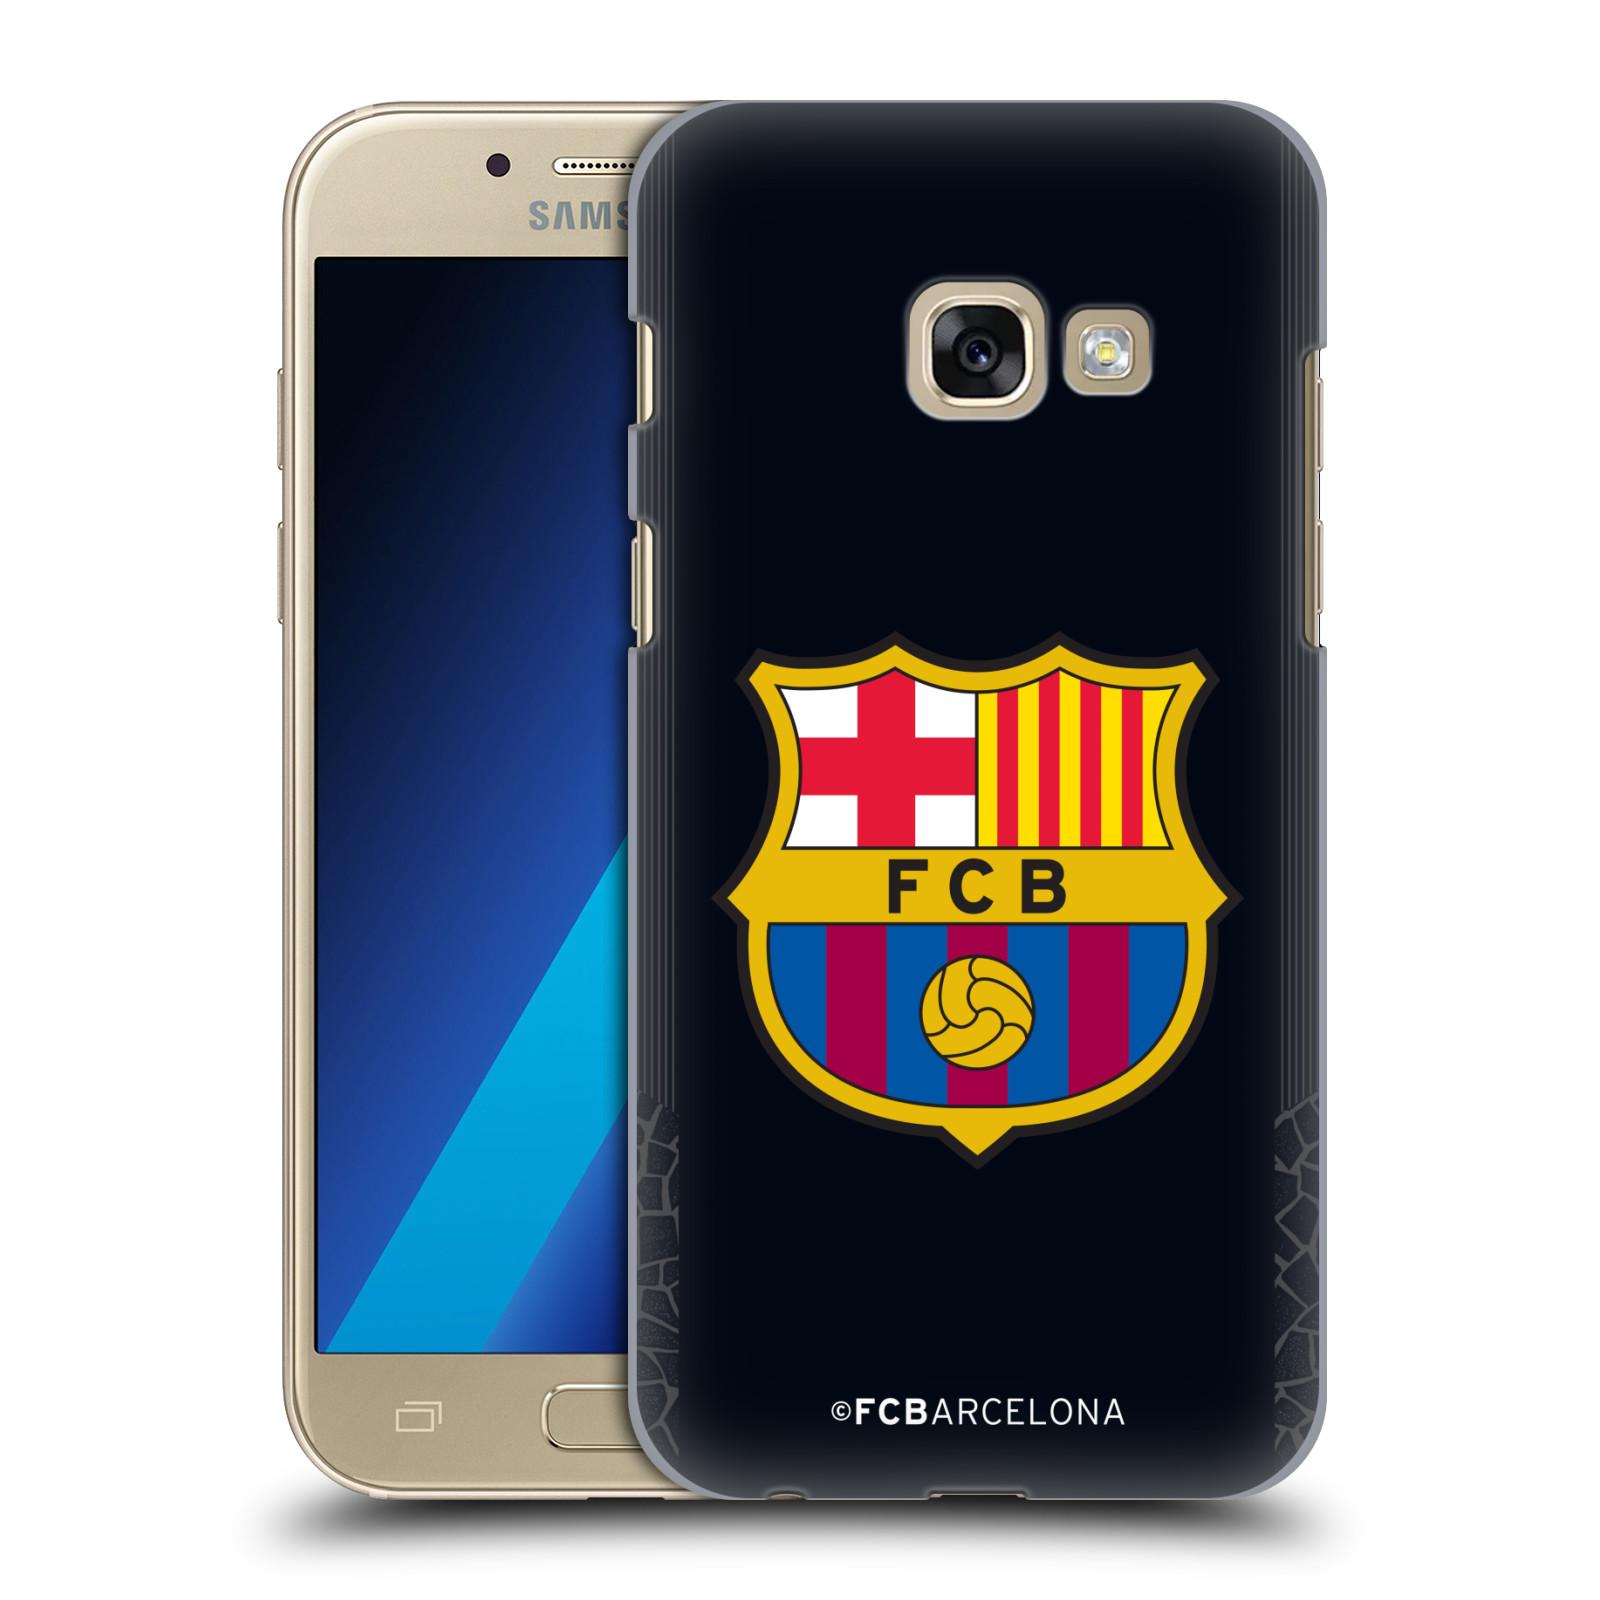 Plastové pouzdro na mobil Samsung Galaxy A3 (2017) - Head Case - FC Barcelona - Goalkeeper black logo